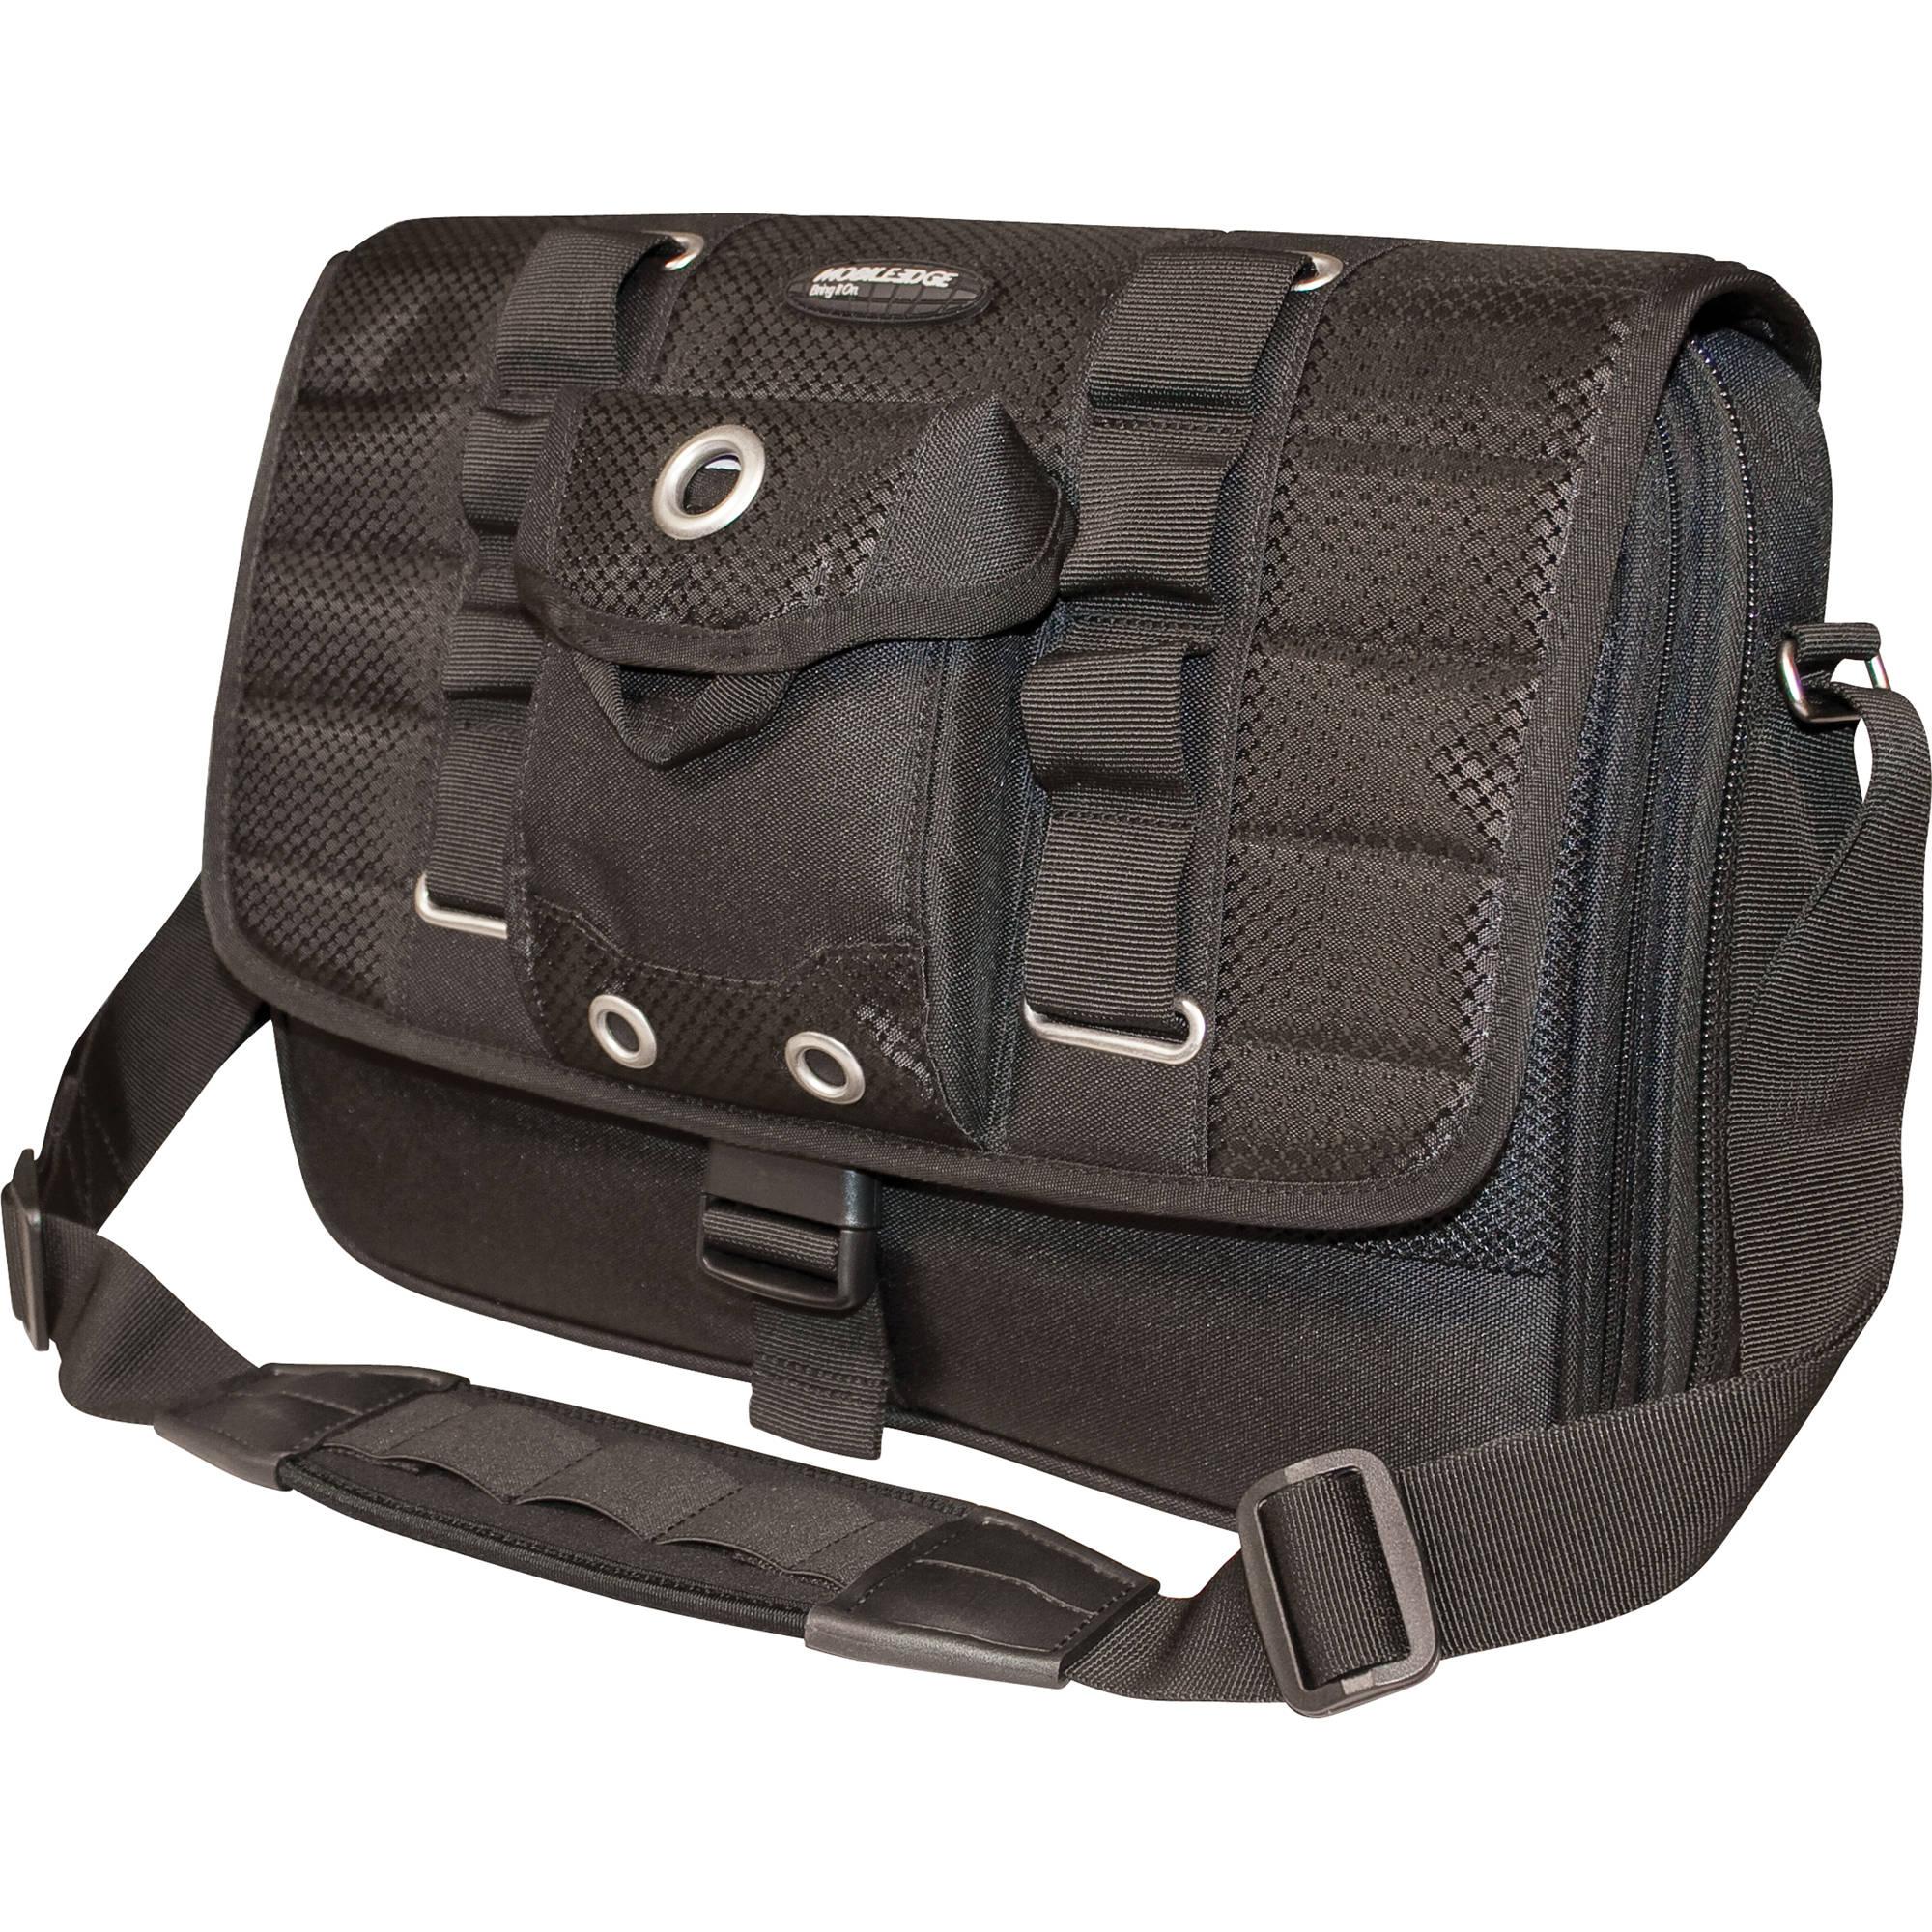 Mobile Edge Scanfast Netbook Messenger Bag Black